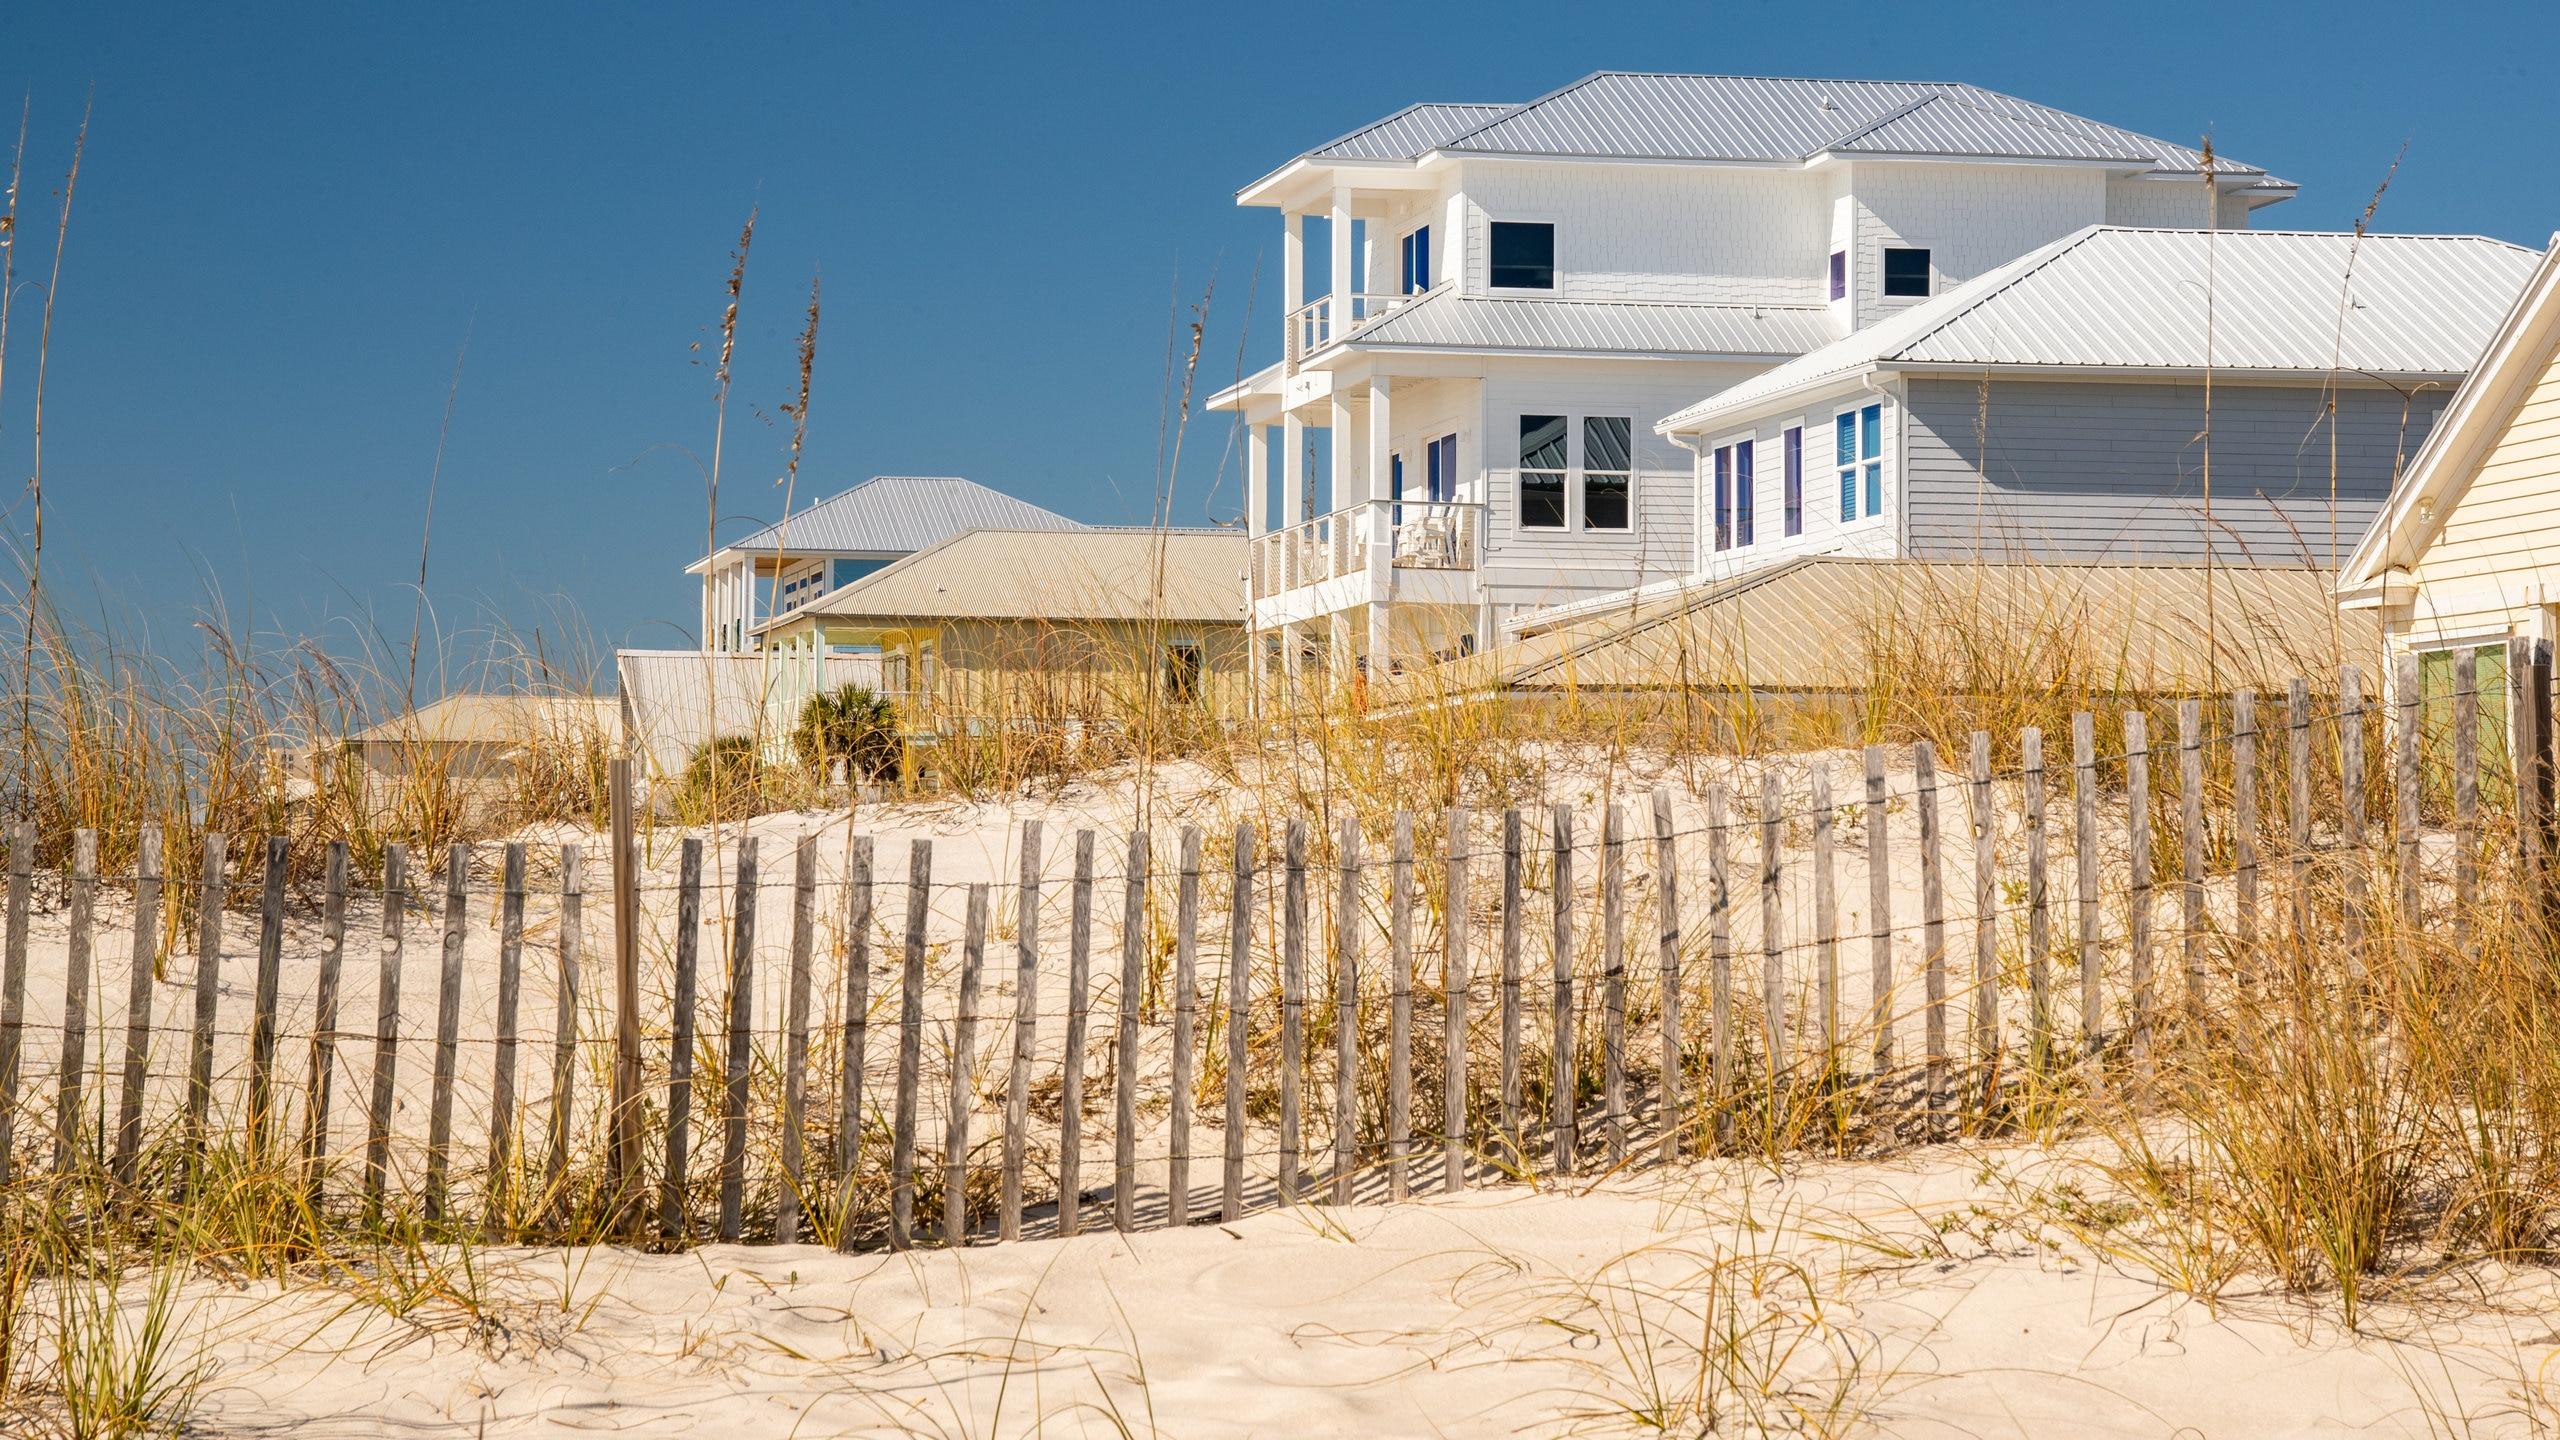 West Beach, Gulf Shores, Alabama, United States of America